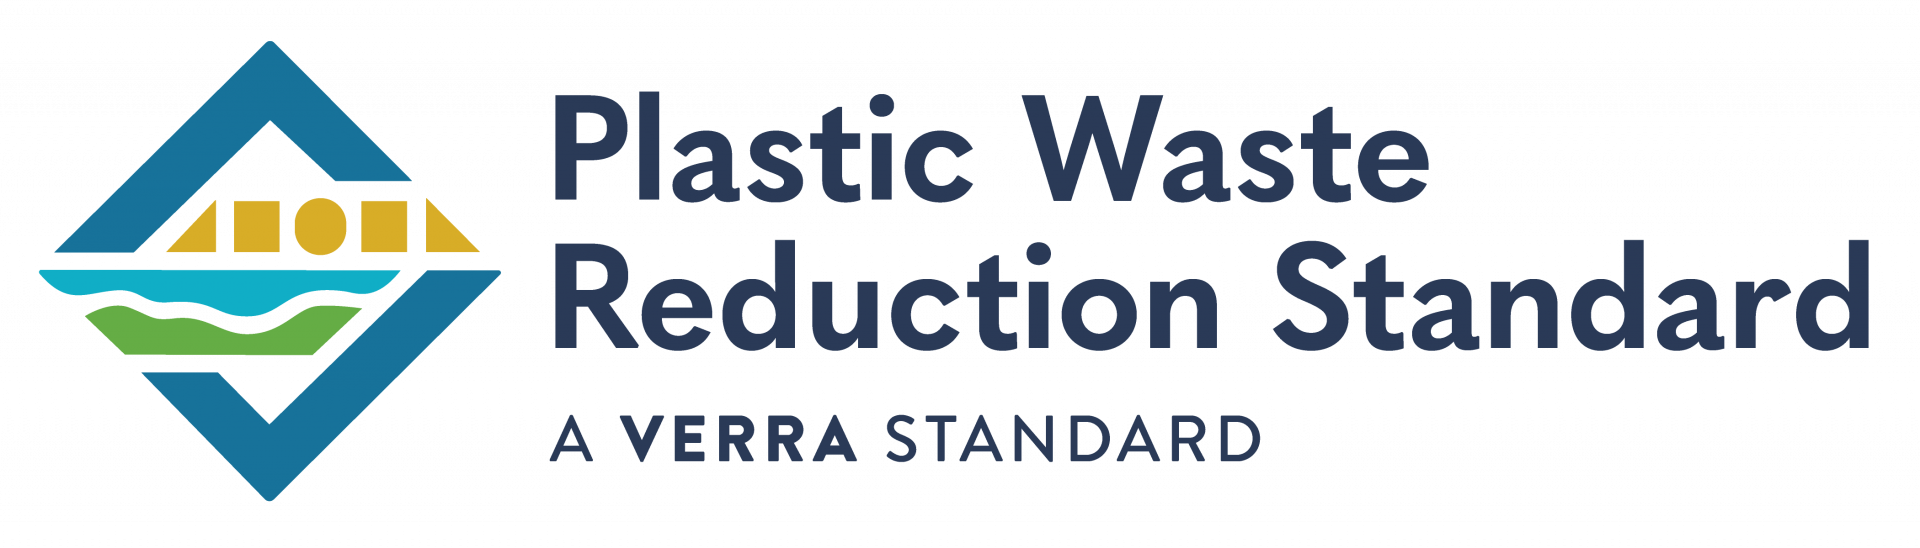 Plastic Waste Reduction Standard